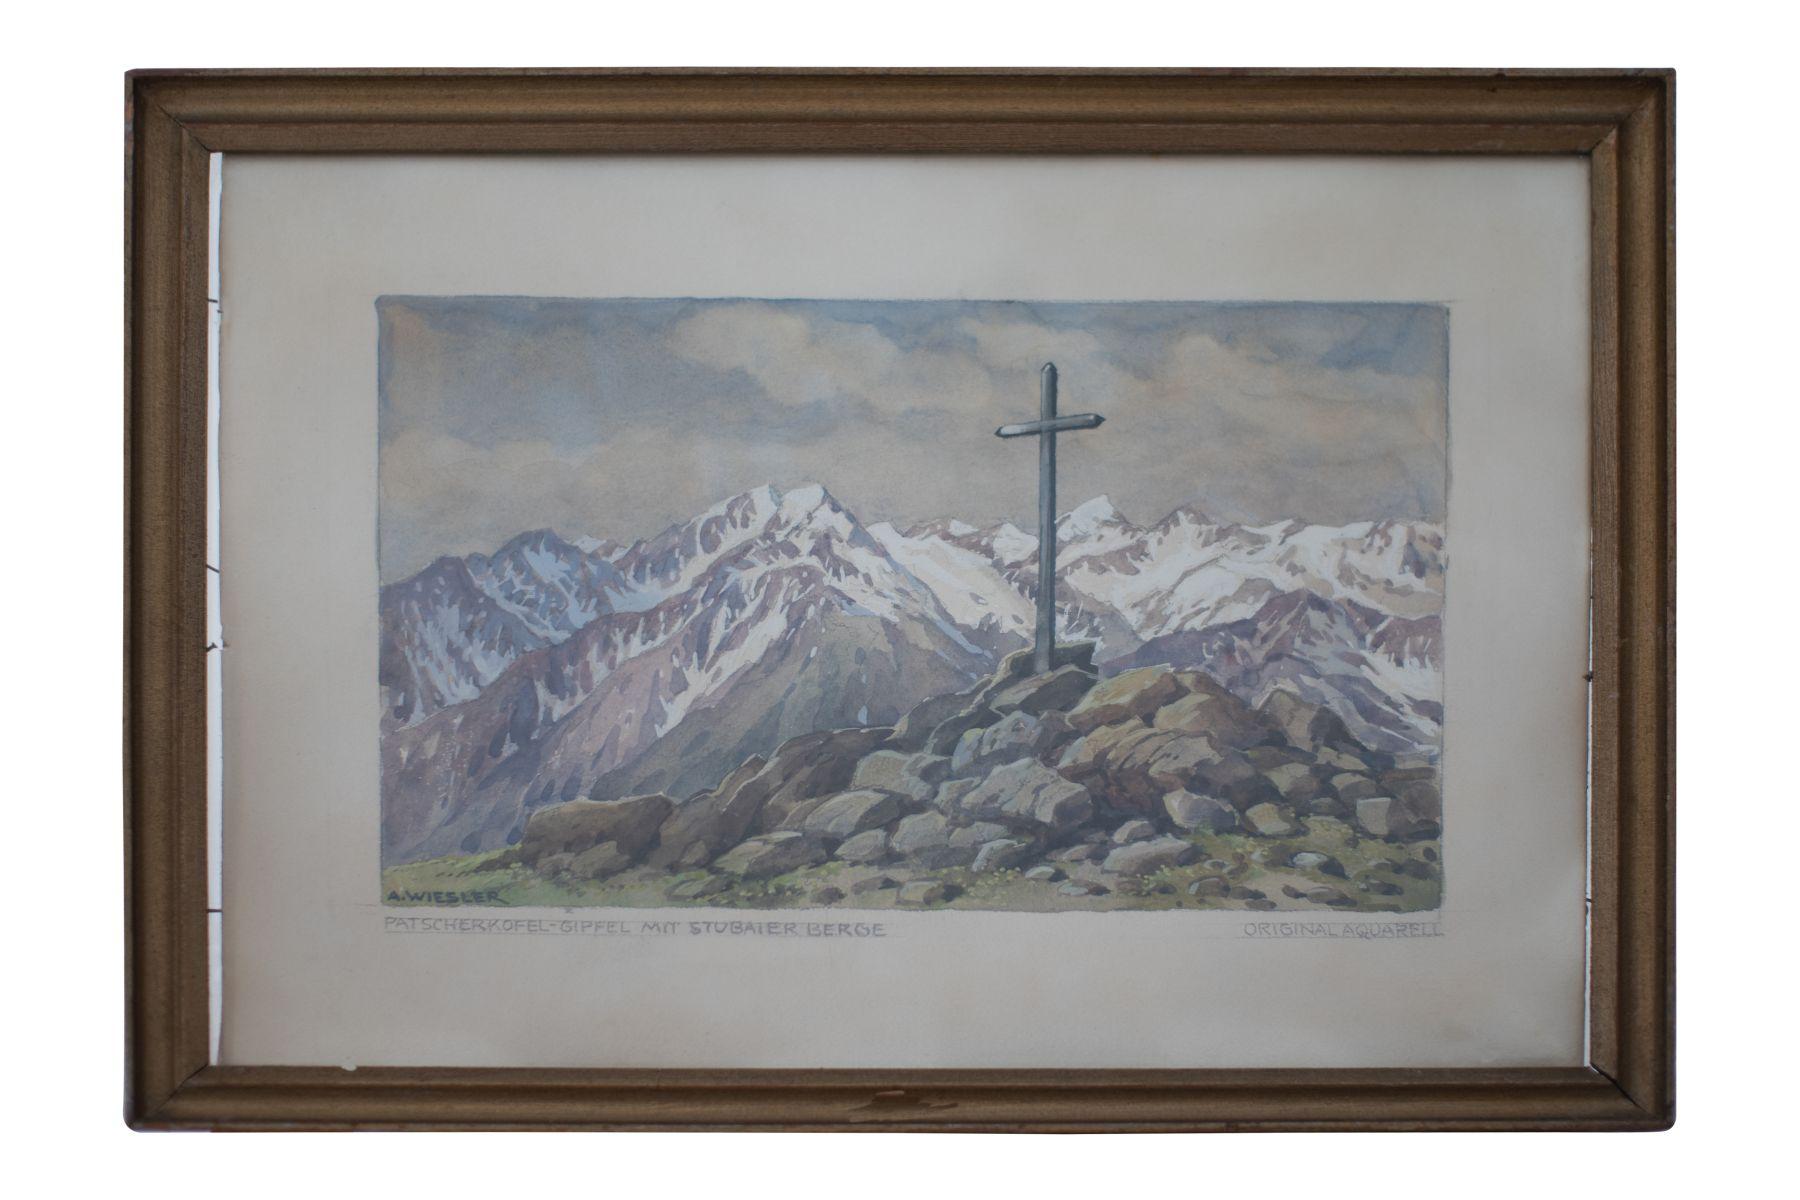 "#96 Patschakofel peak with view of Stubai mountains | Adolf Wiesler (1978-1958) ""Patschakofel Gipfel mit Blick auf Stubaier Berge"" Image"